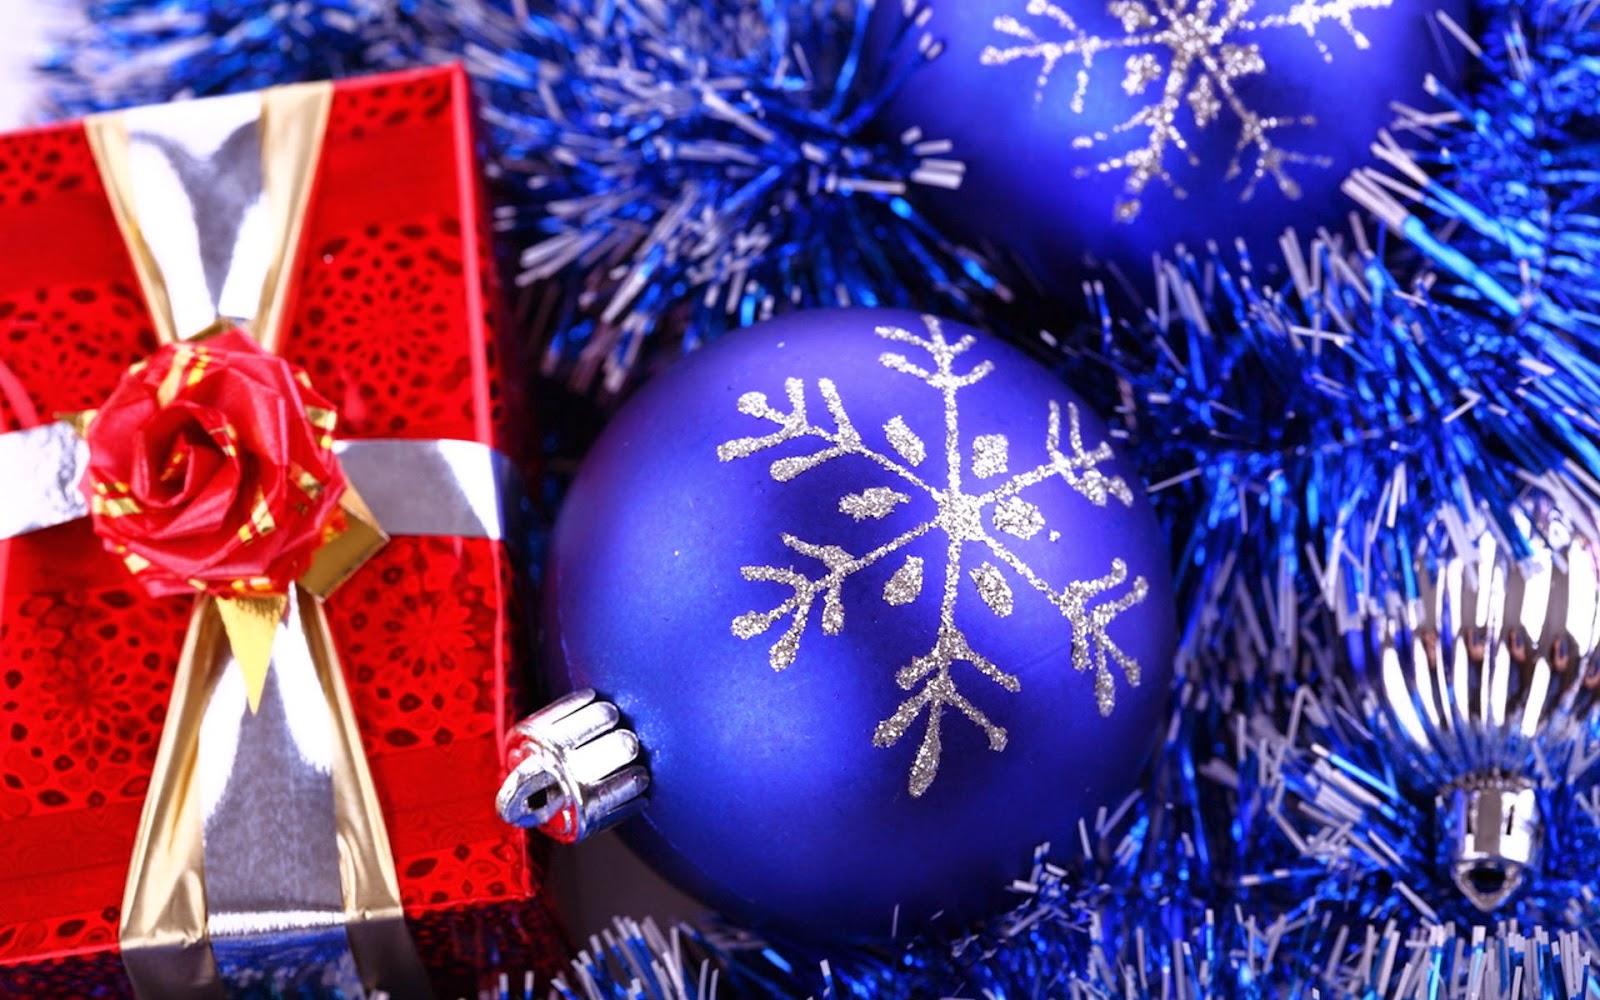 Awesome Deep Blue Christmas Bulbs Ornament